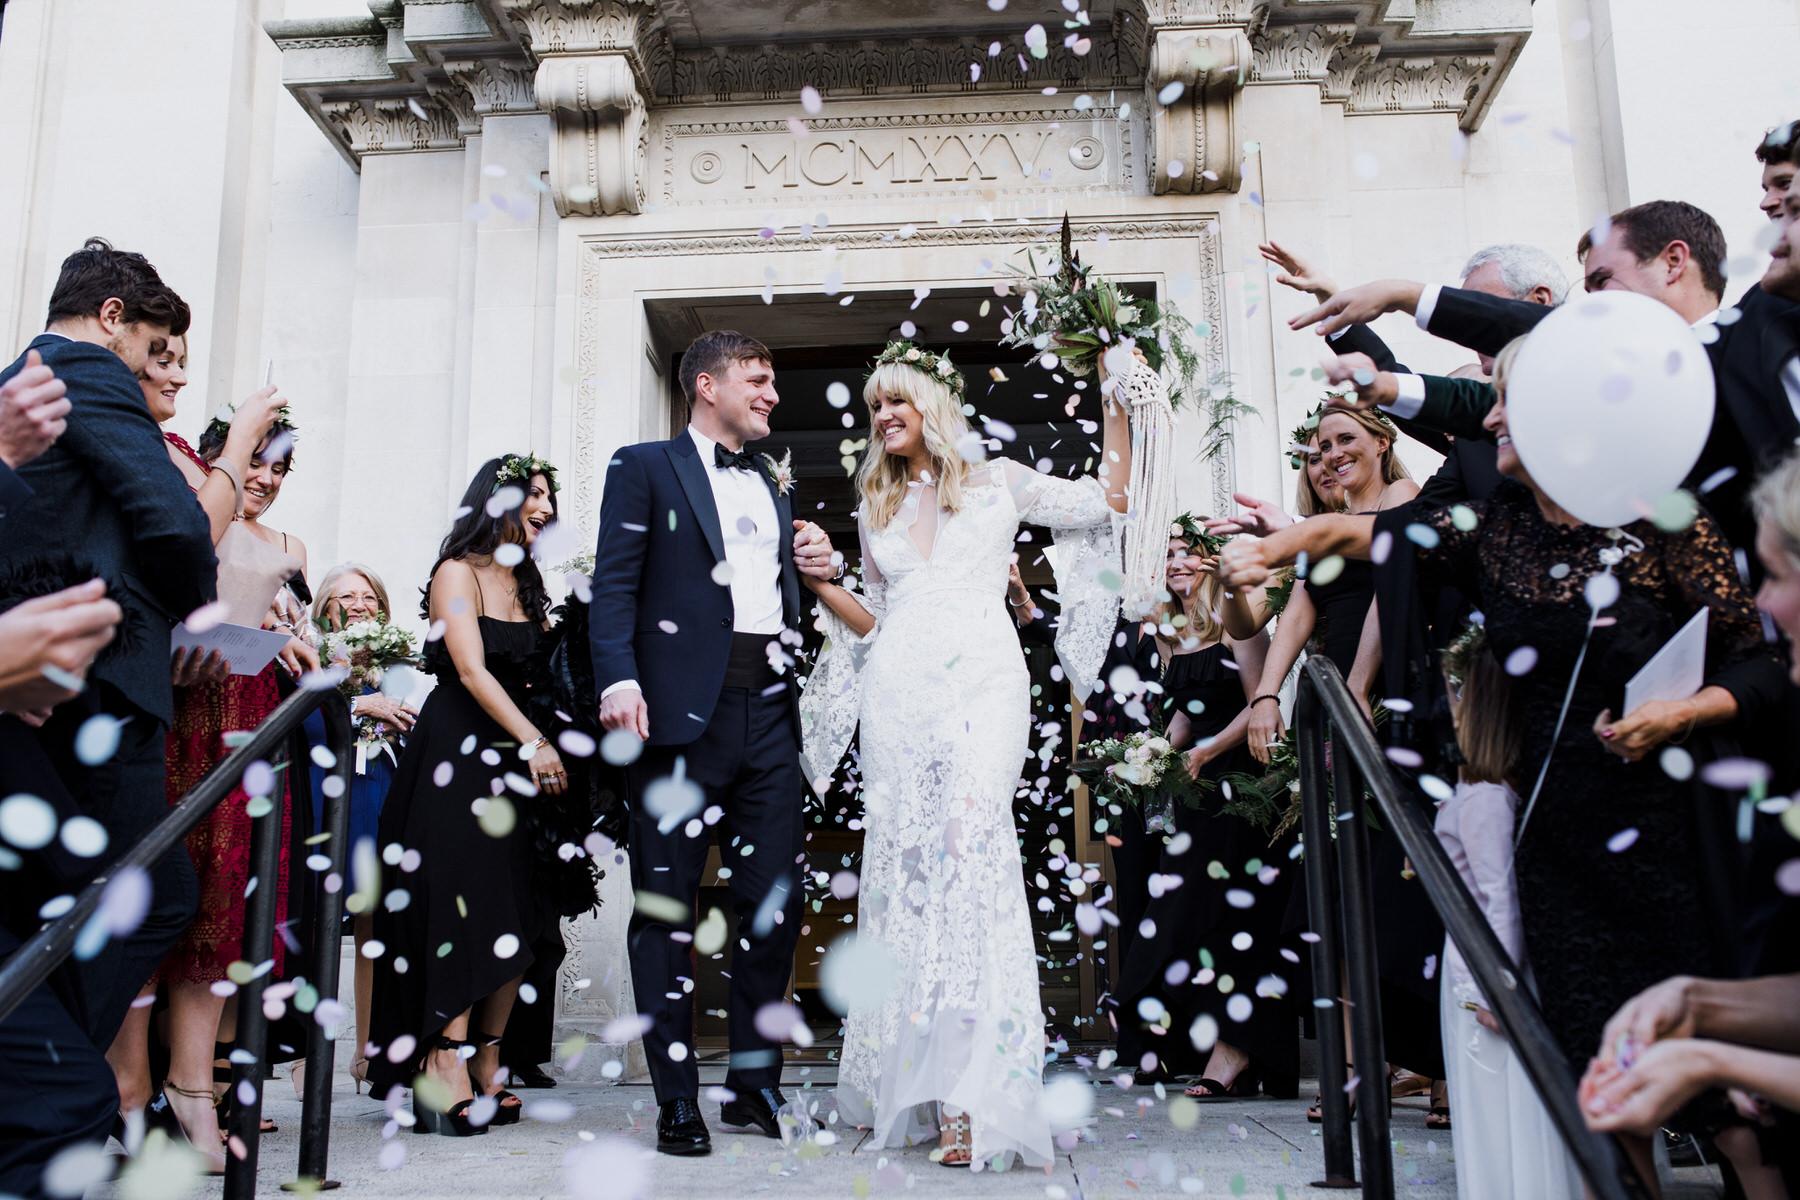 Islington Town Hall bride groom confetti wedding photographer.jpg